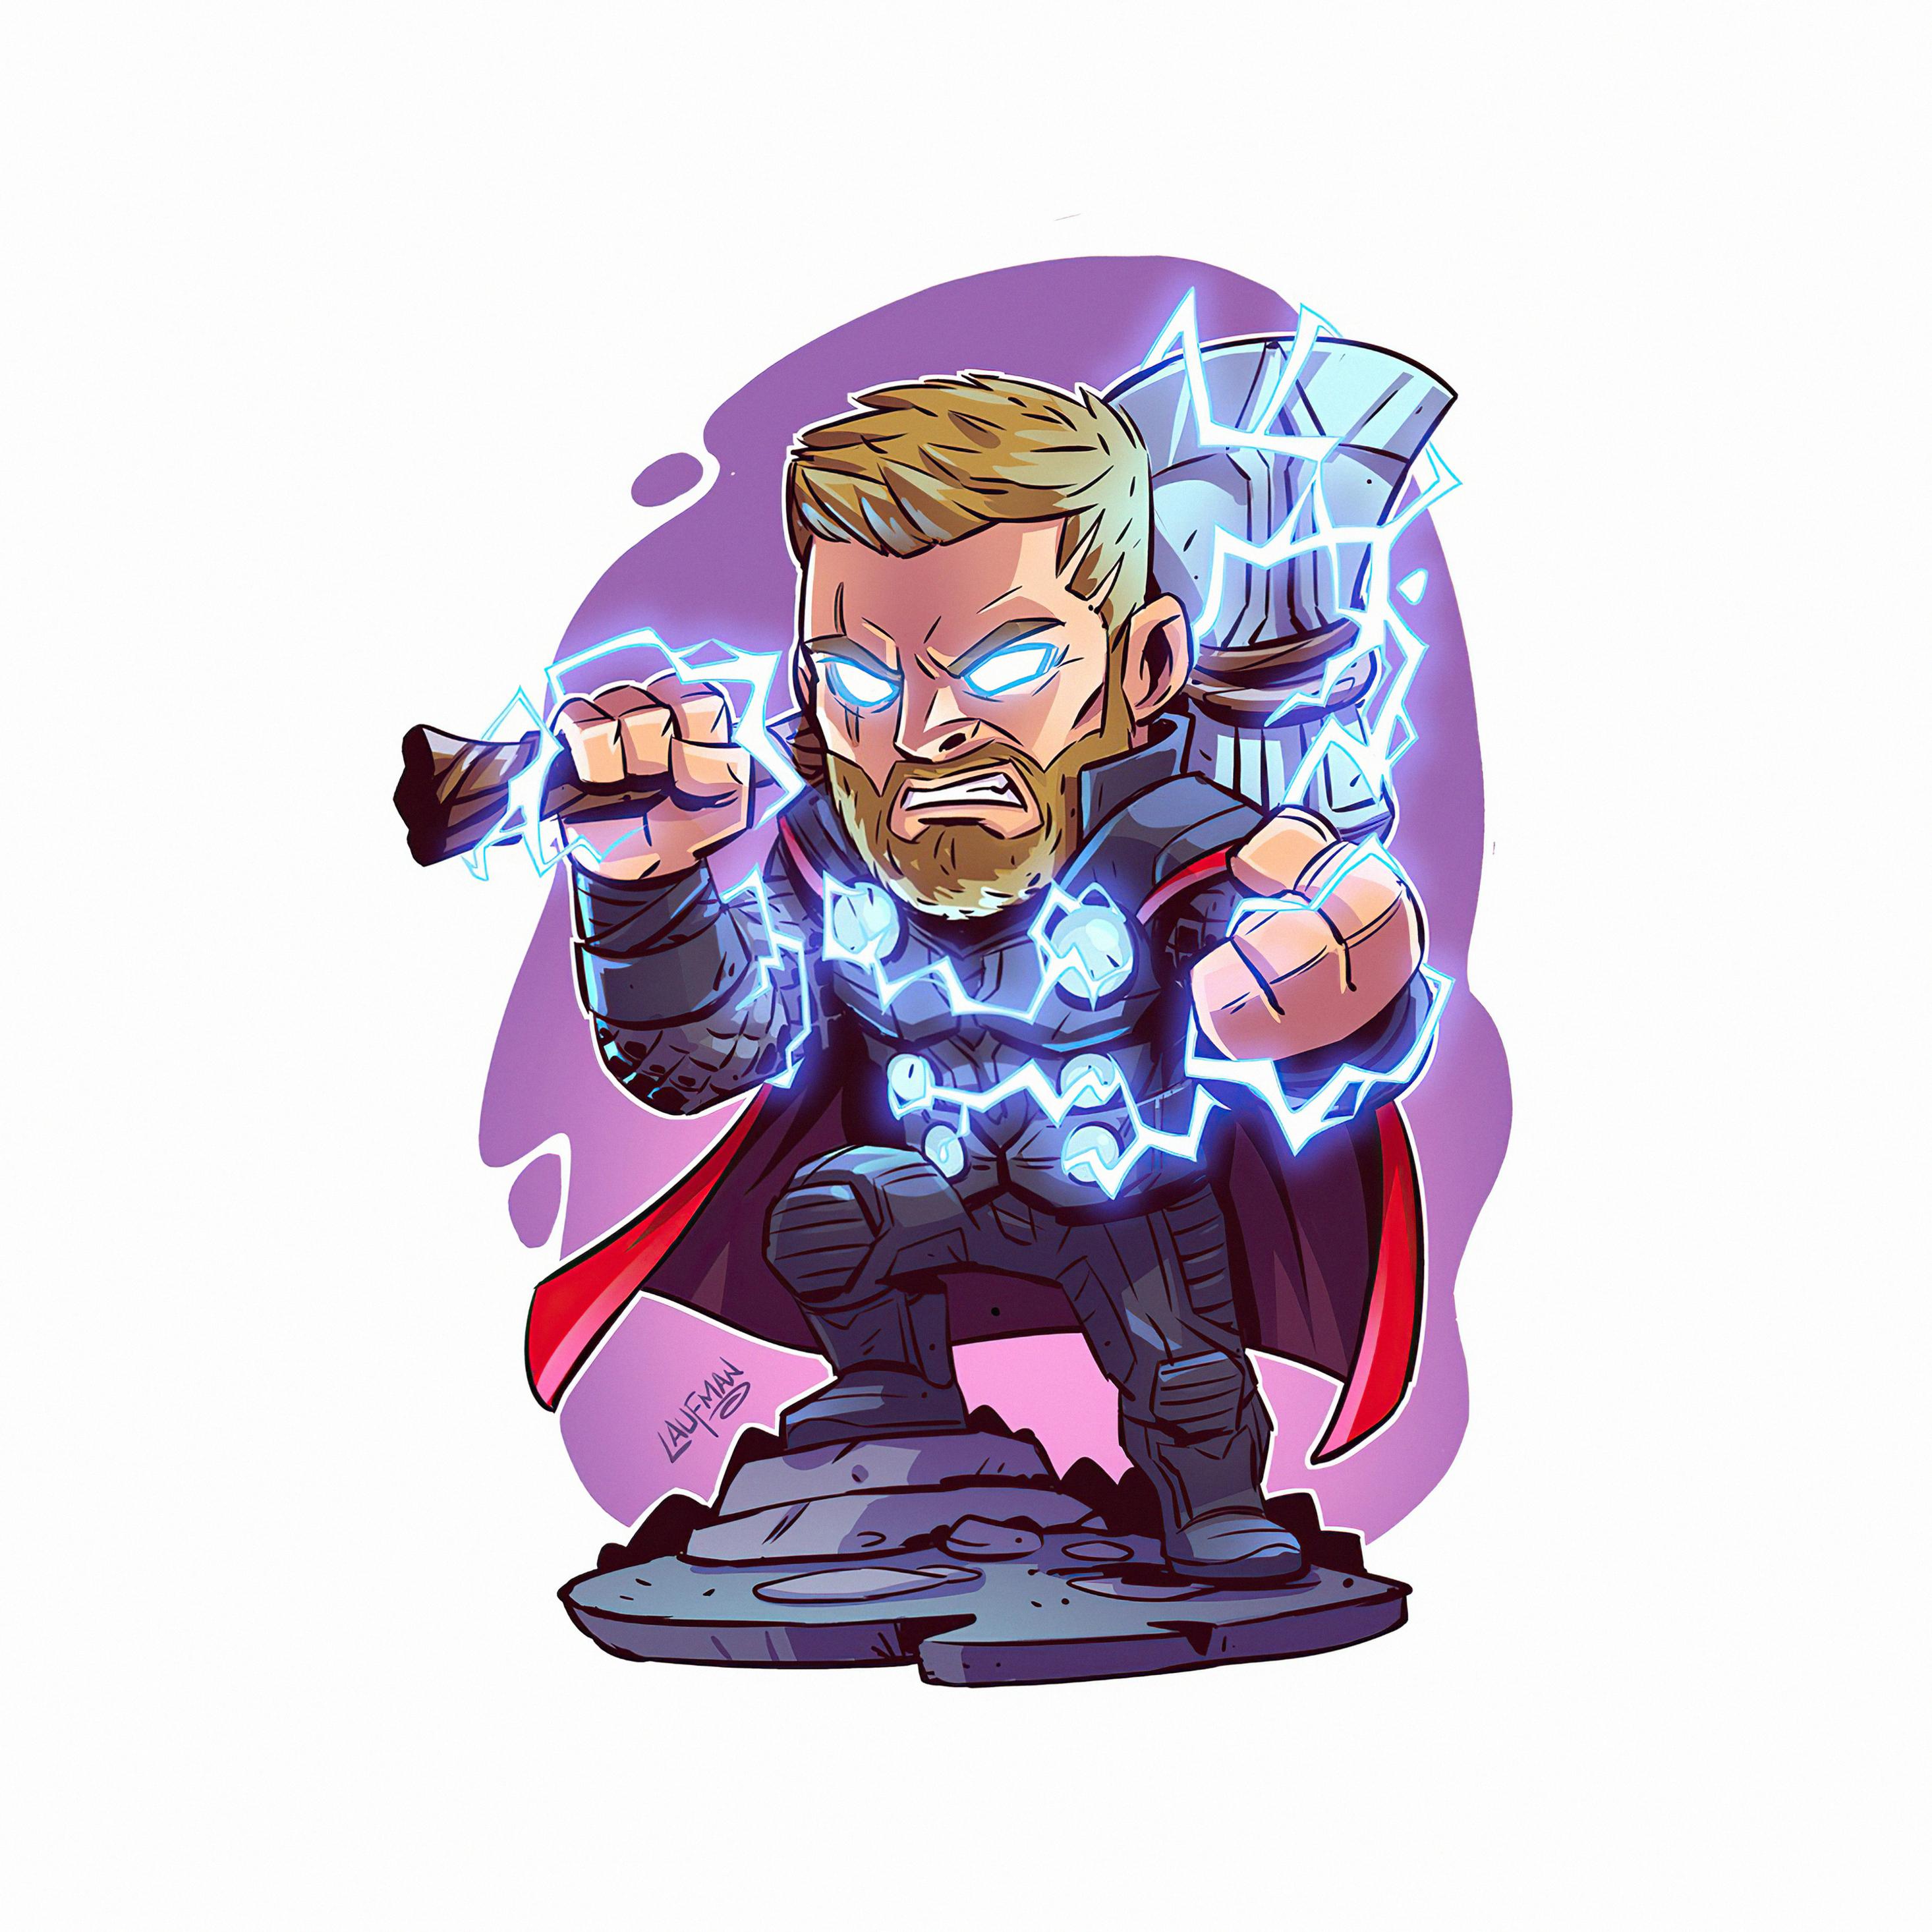 thor-with-hammer-minimal-5k-ep.jpg